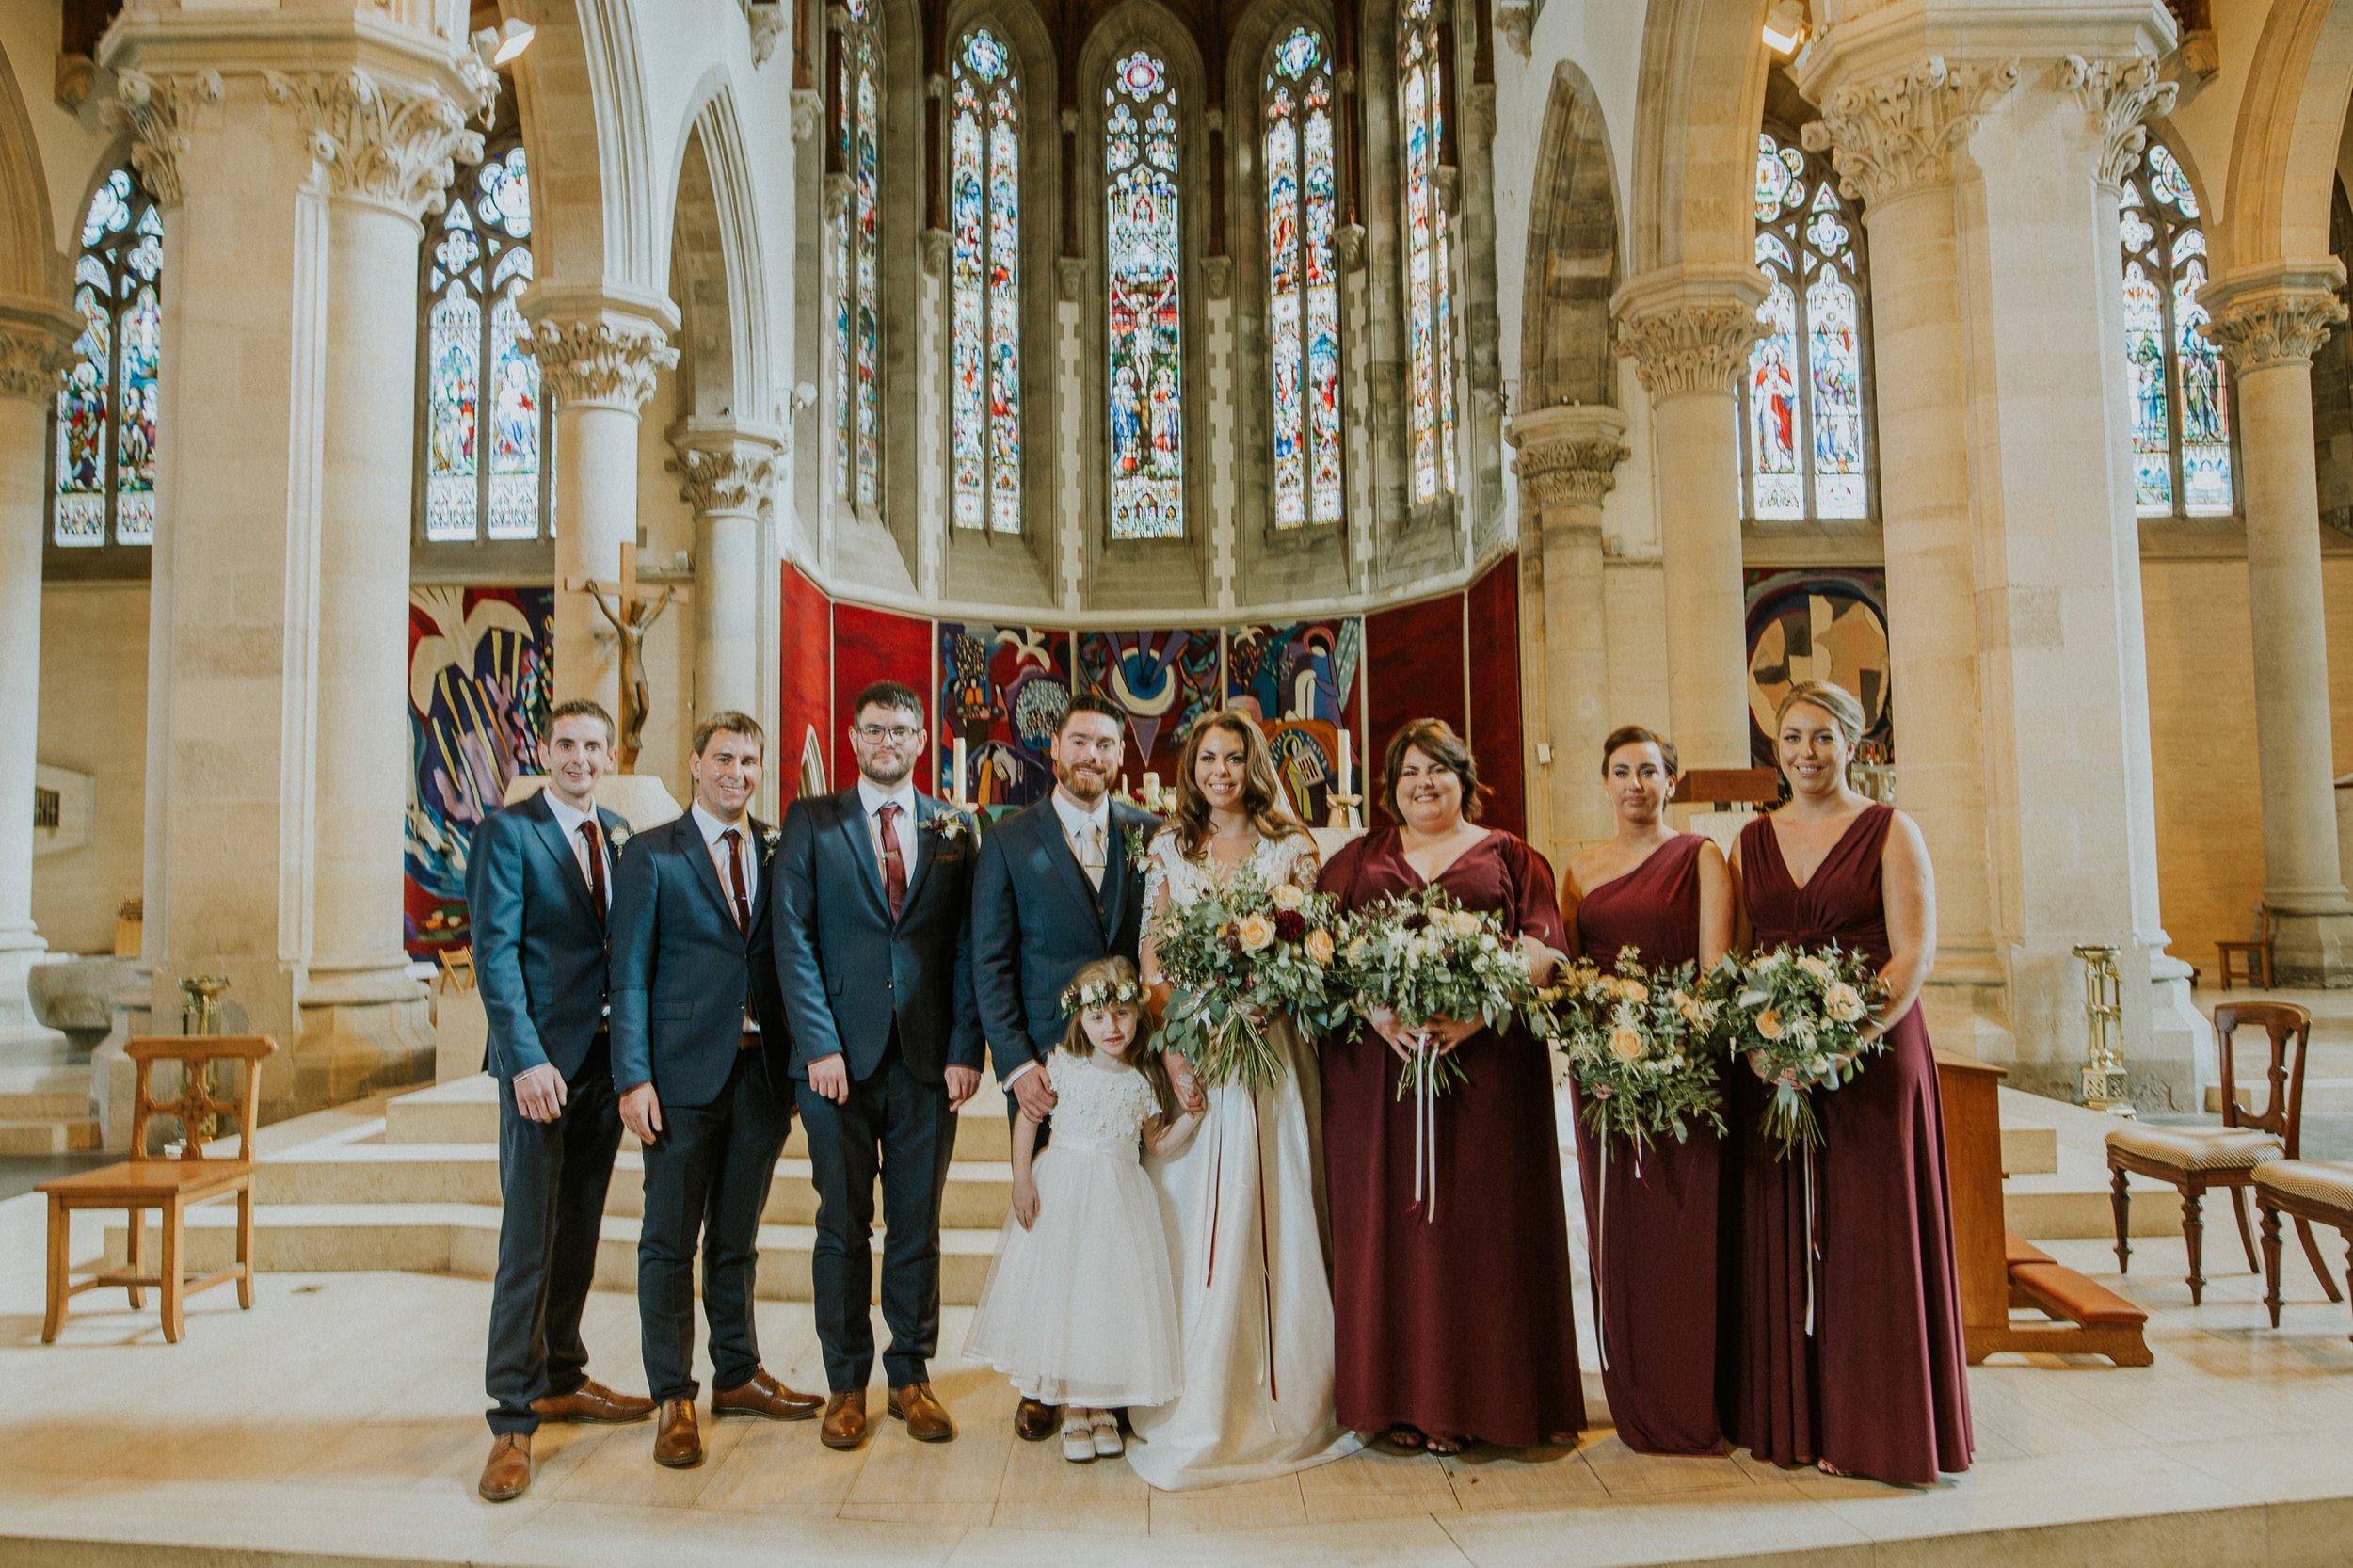 Paula Kenny Wedding Photos Castle Leslie-499.jpg